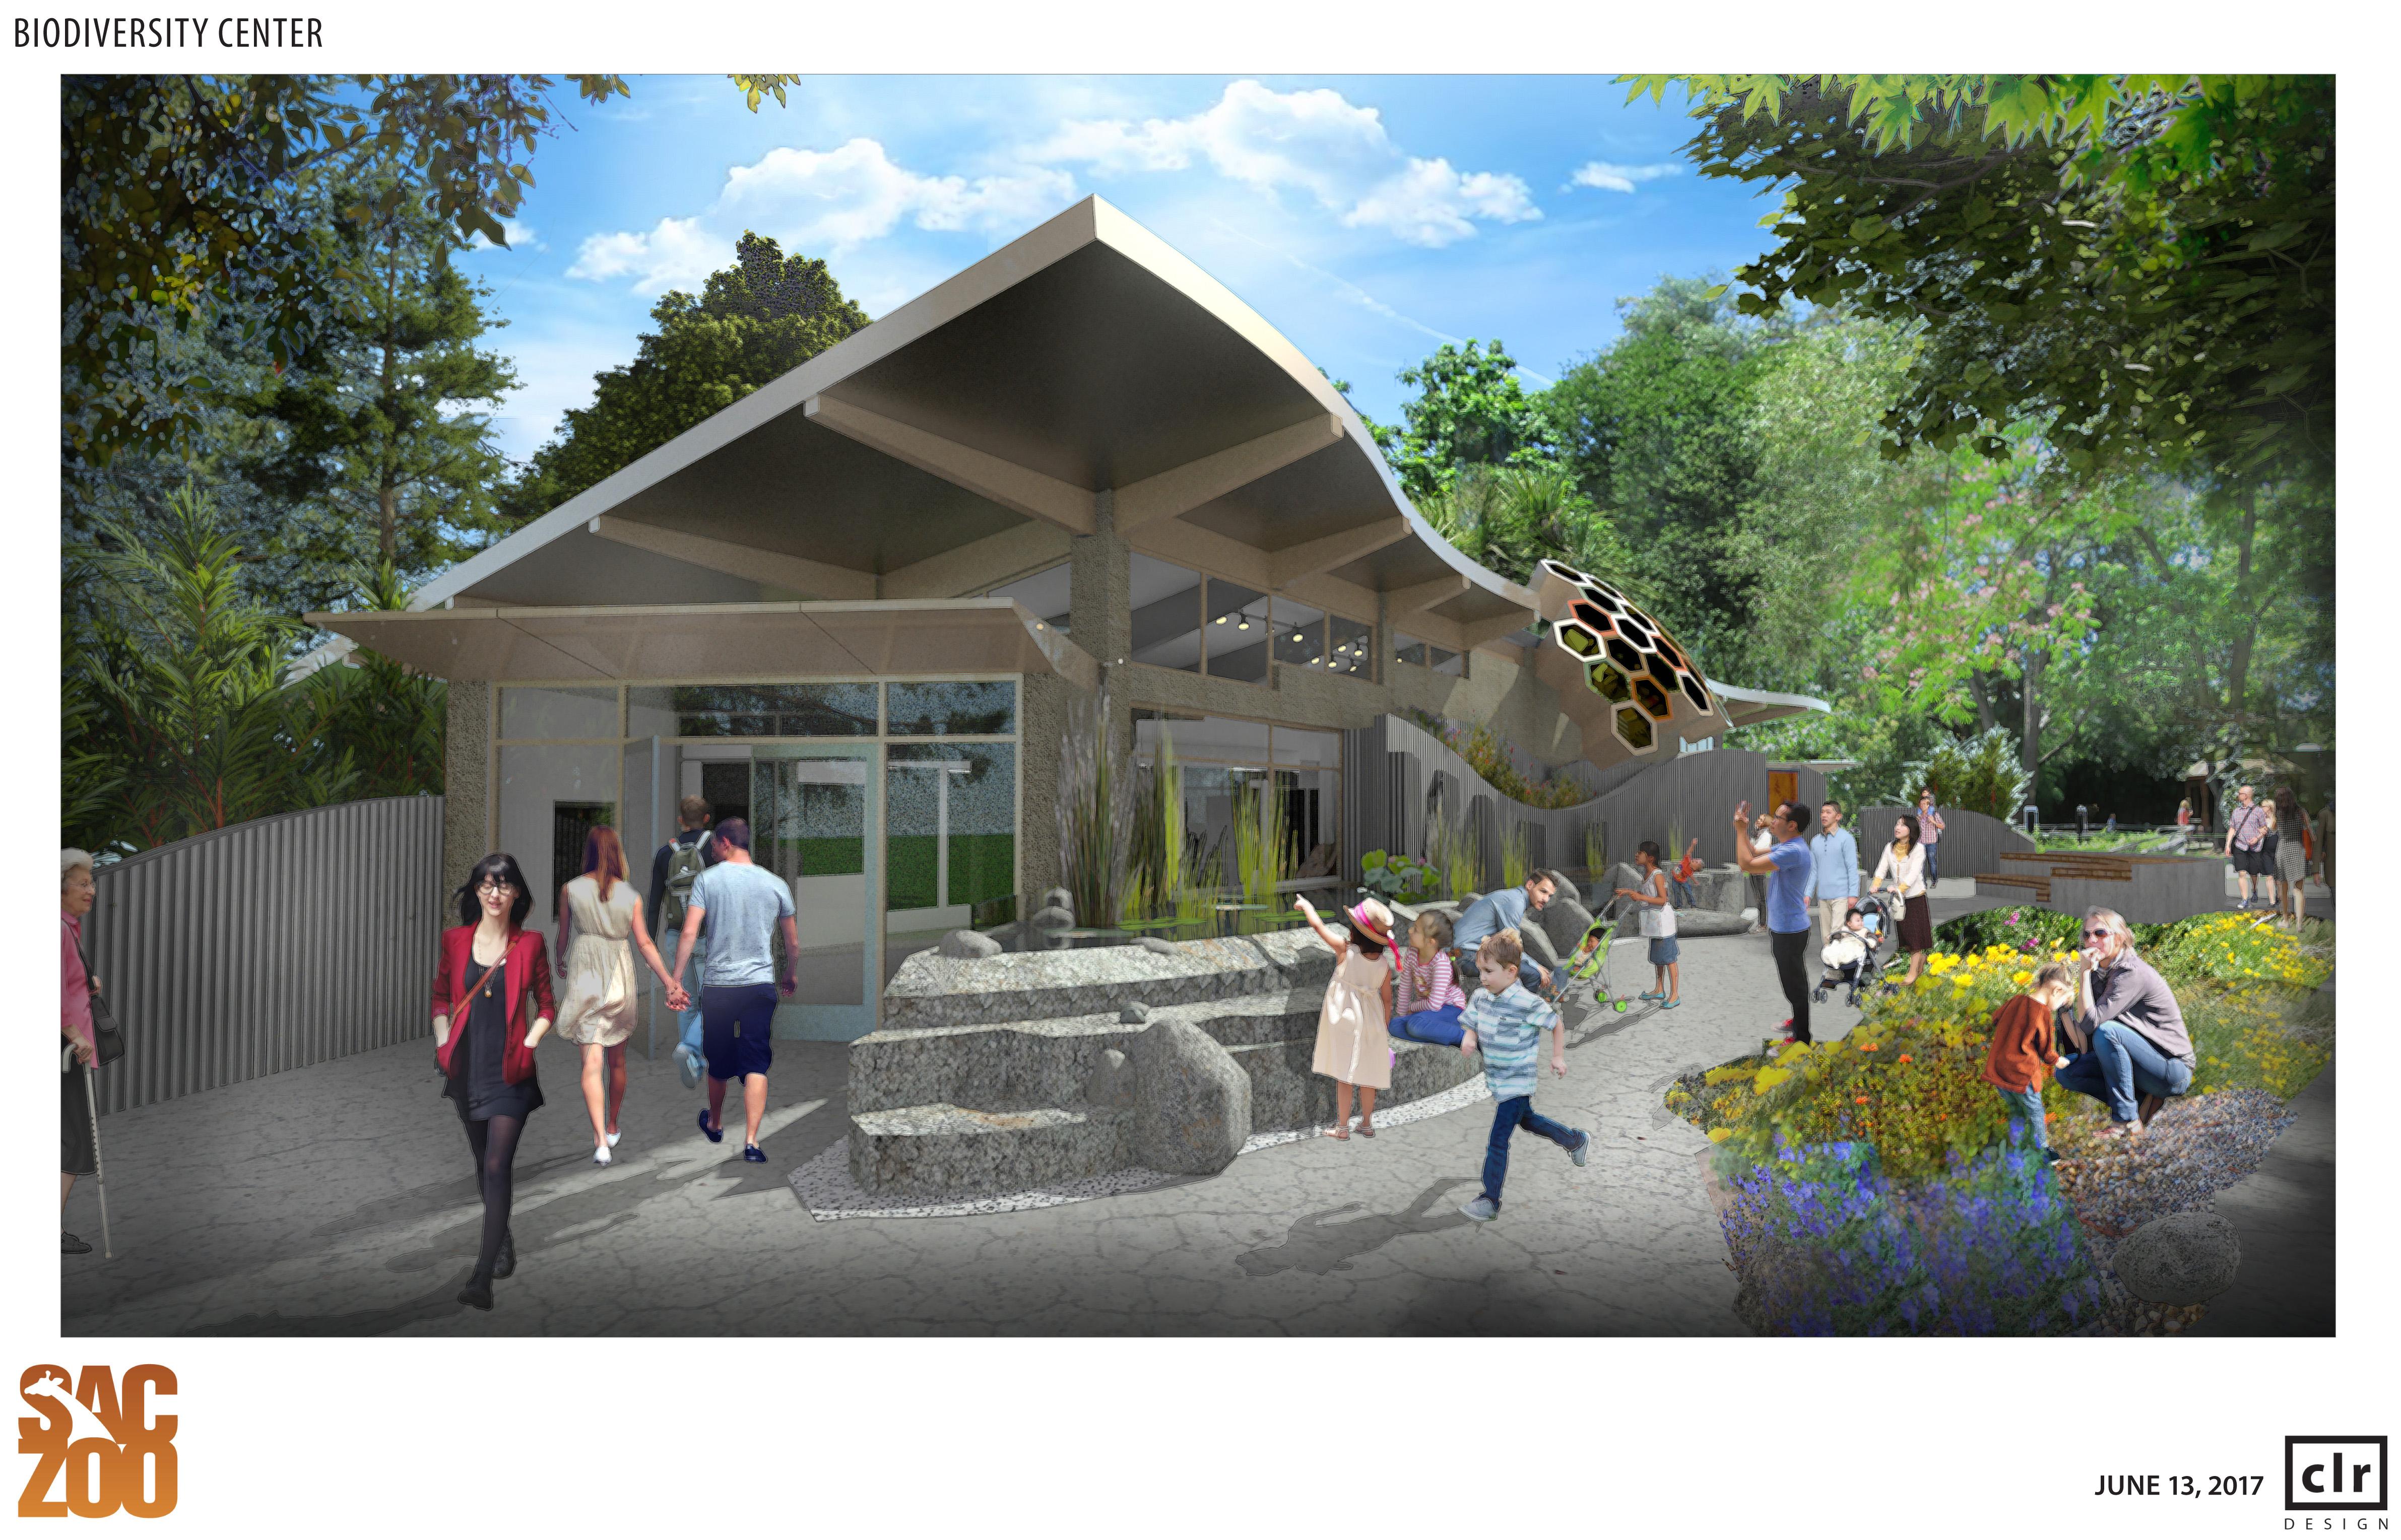 Biodiversity Center Rendering - Entrance